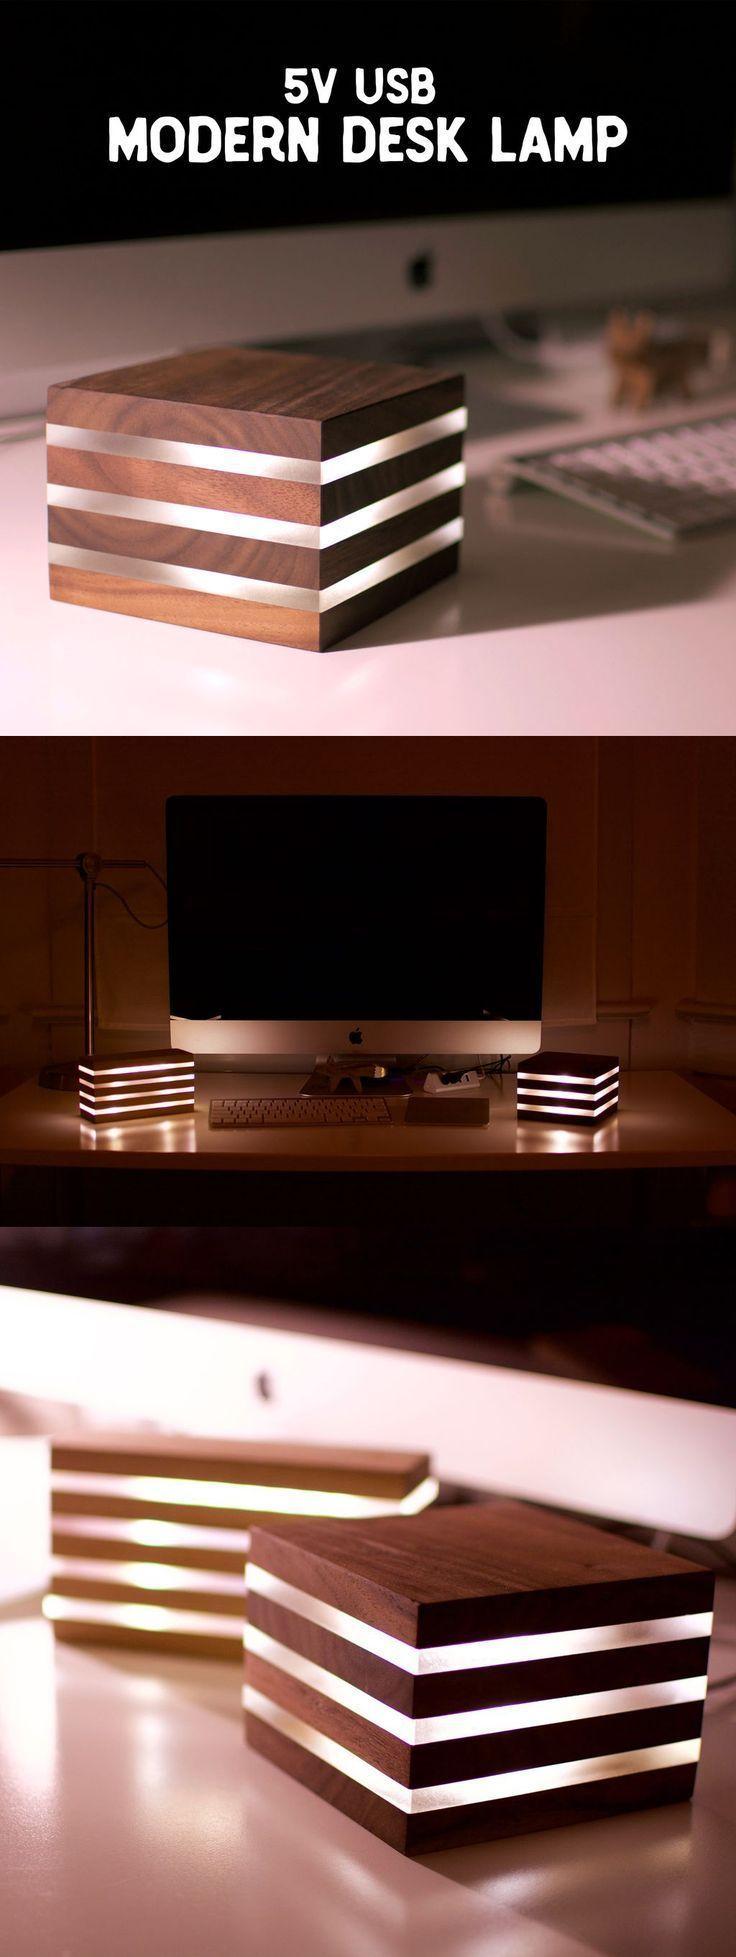 Moderne LED Schreibtischlampe… Betrieb avec 5V USB – # 5V # Betrieb avec #LE… #WoodWorking – Wood Design